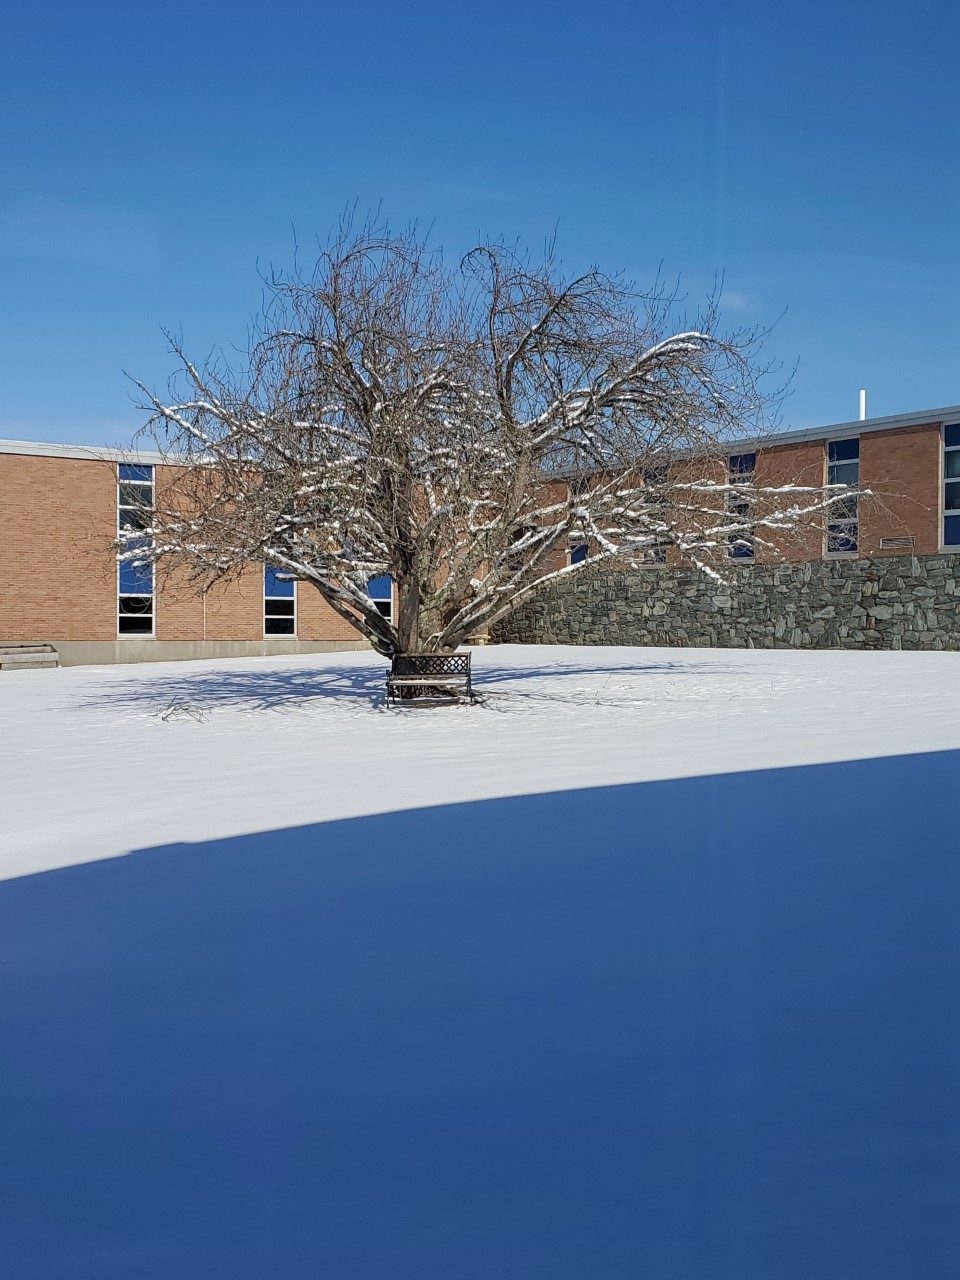 Winter Courtyard